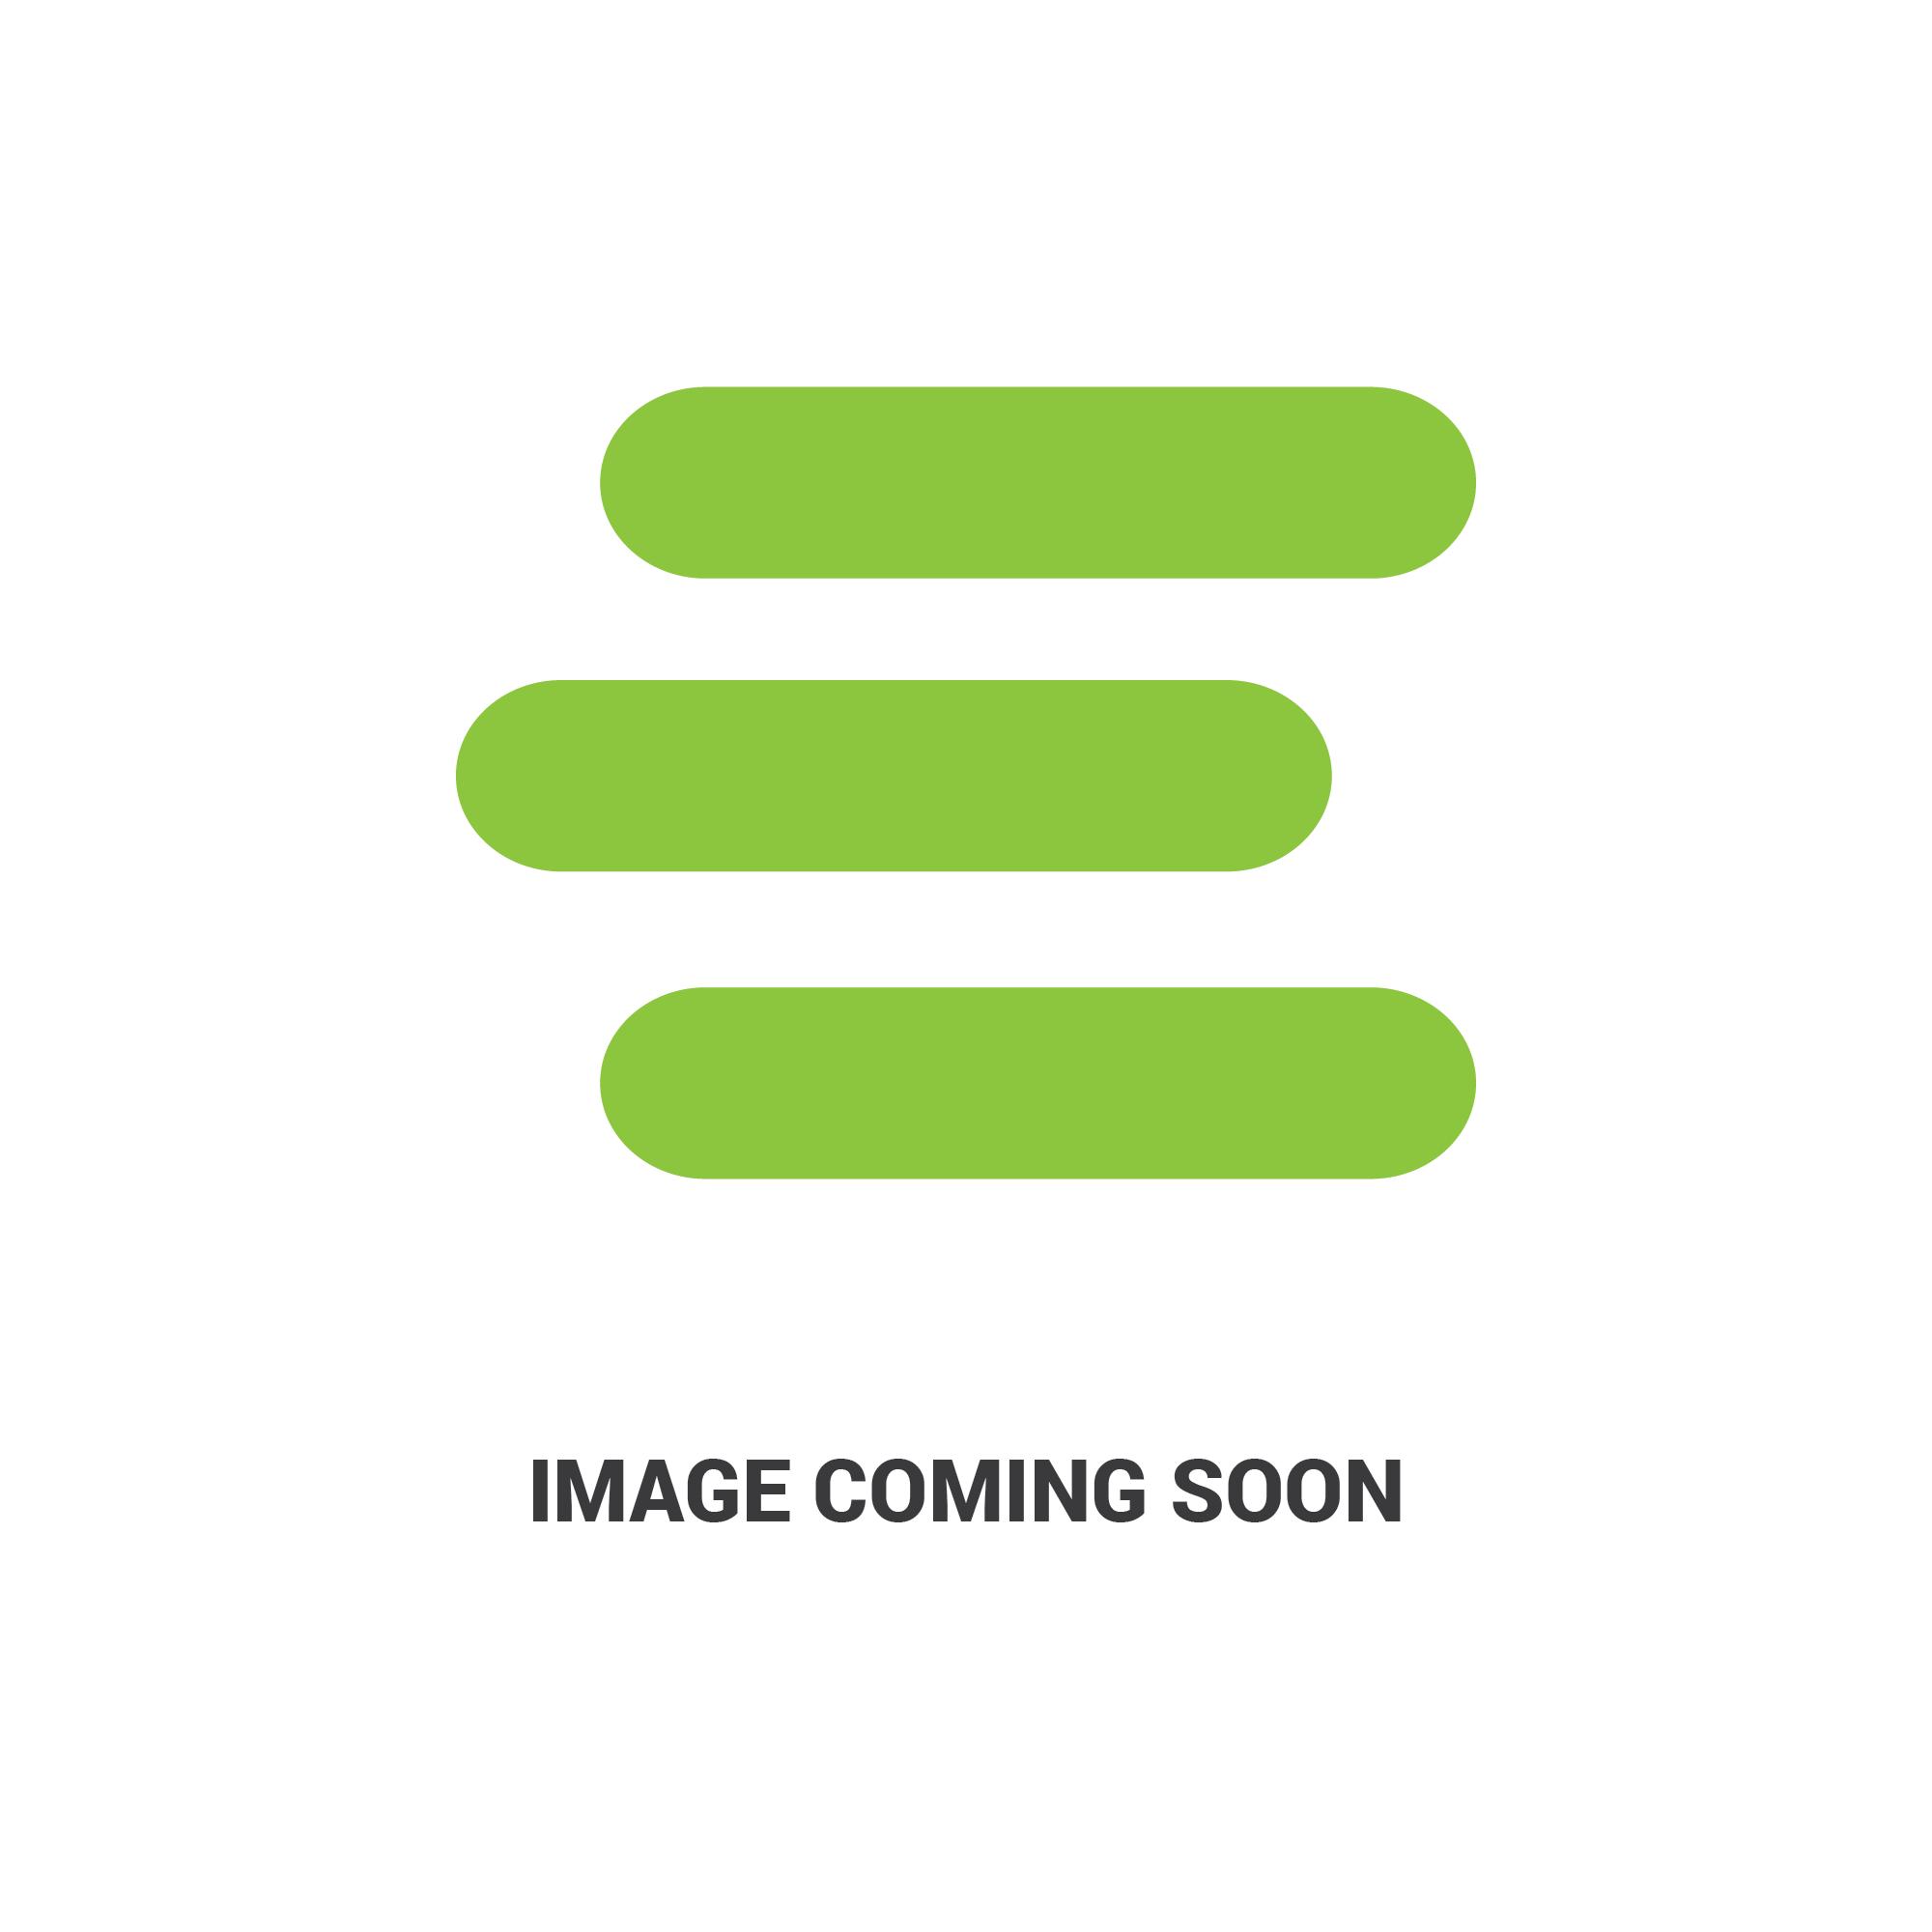 E-67154781380_1.jpg